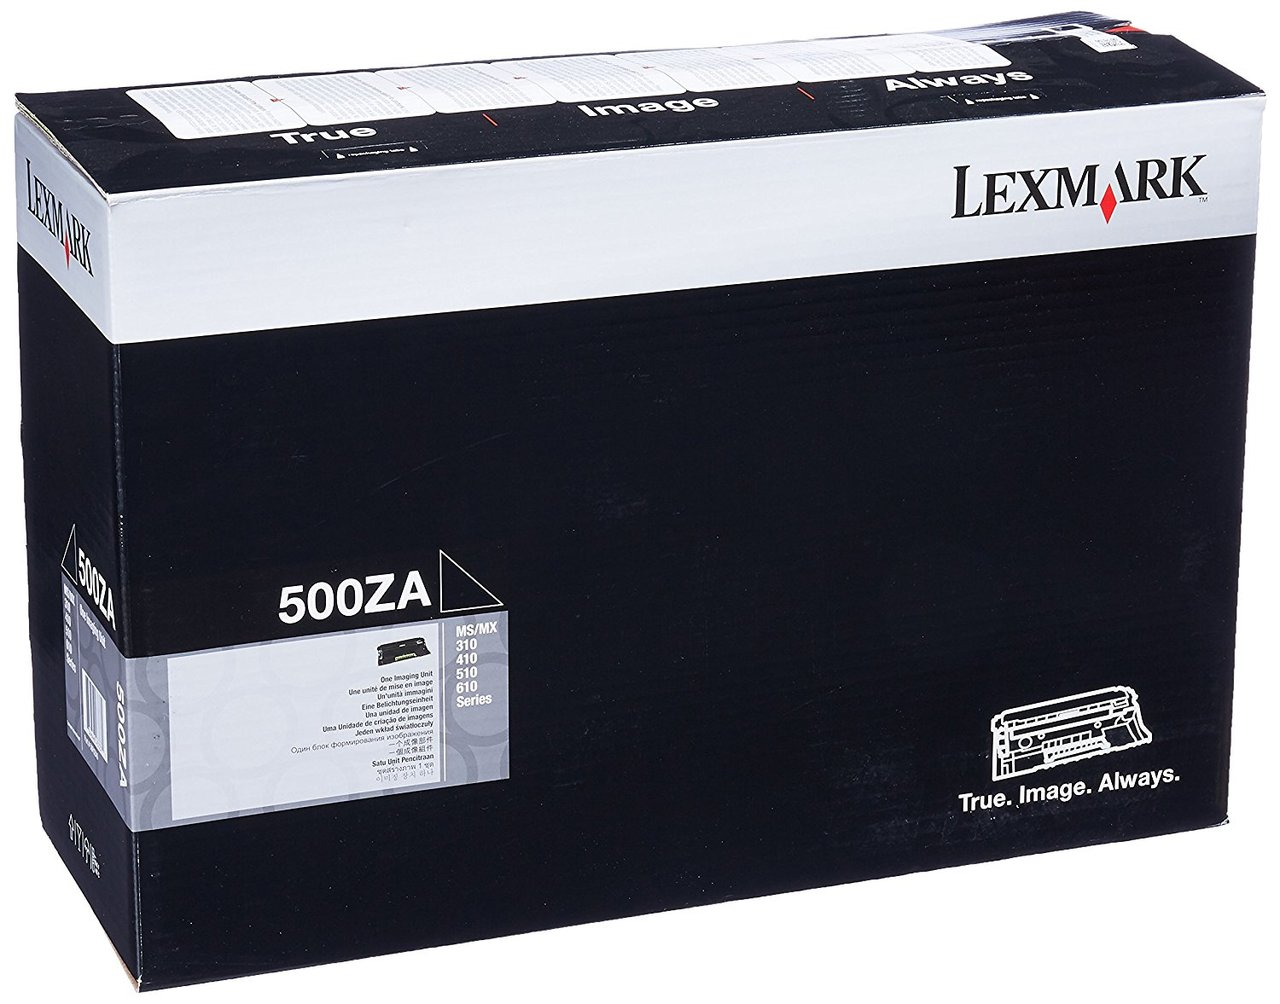 50F0ZA0 | Original Lexmark Imaging Unit – Black